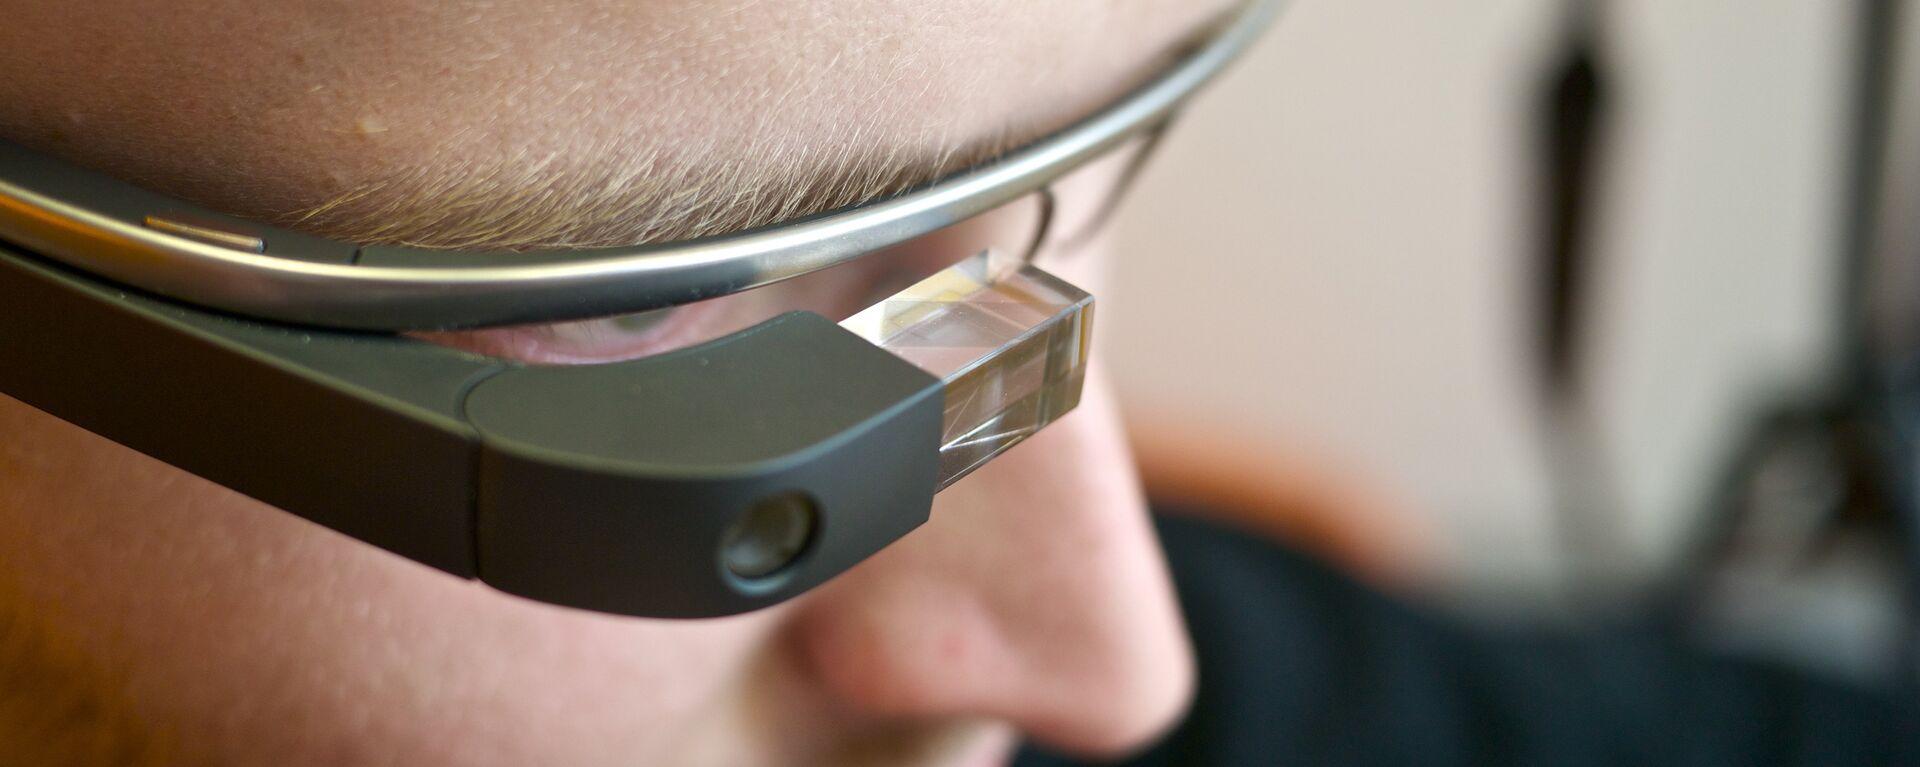 Las gafas inteligentes Google Glass - Sputnik Mundo, 1920, 18.07.2017